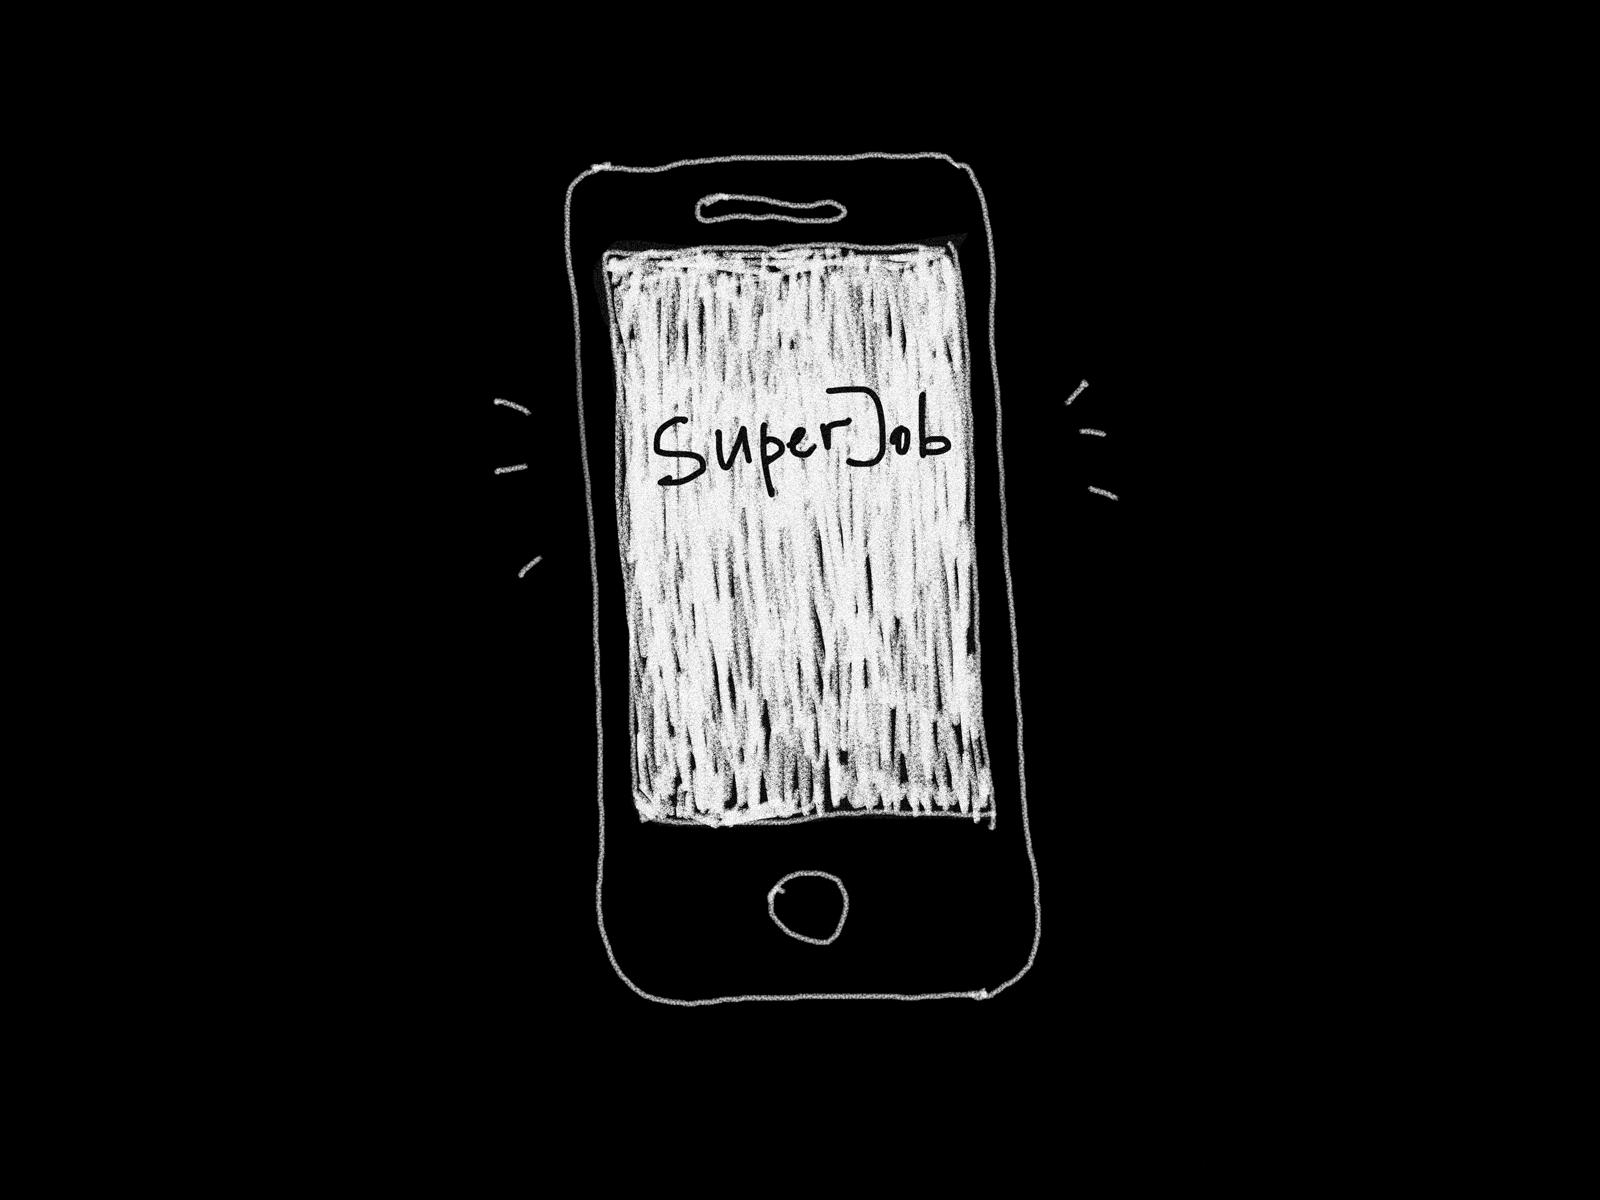 IT-meetup Superjob «iOS — архитектура дизайна, кода, деплоя» (отчет, презентации, видео)